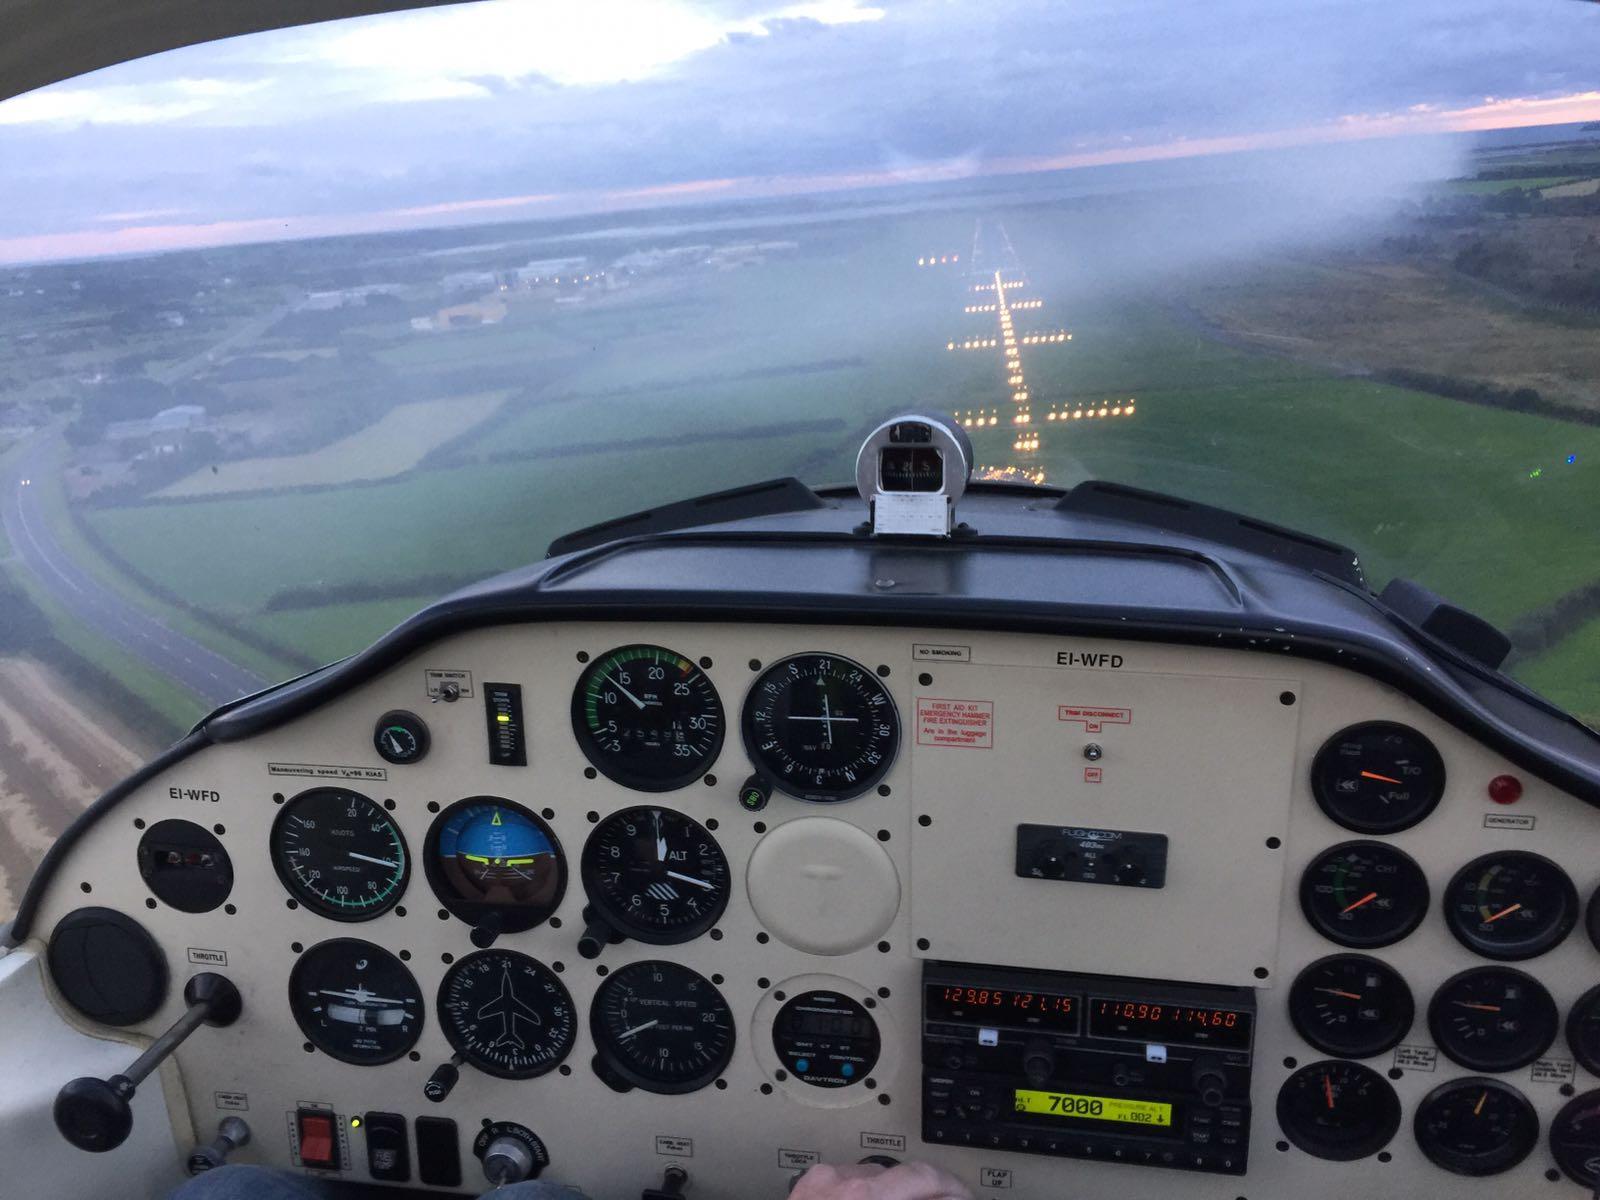 Approaching Runway 21 in Waterford in EI-WFD